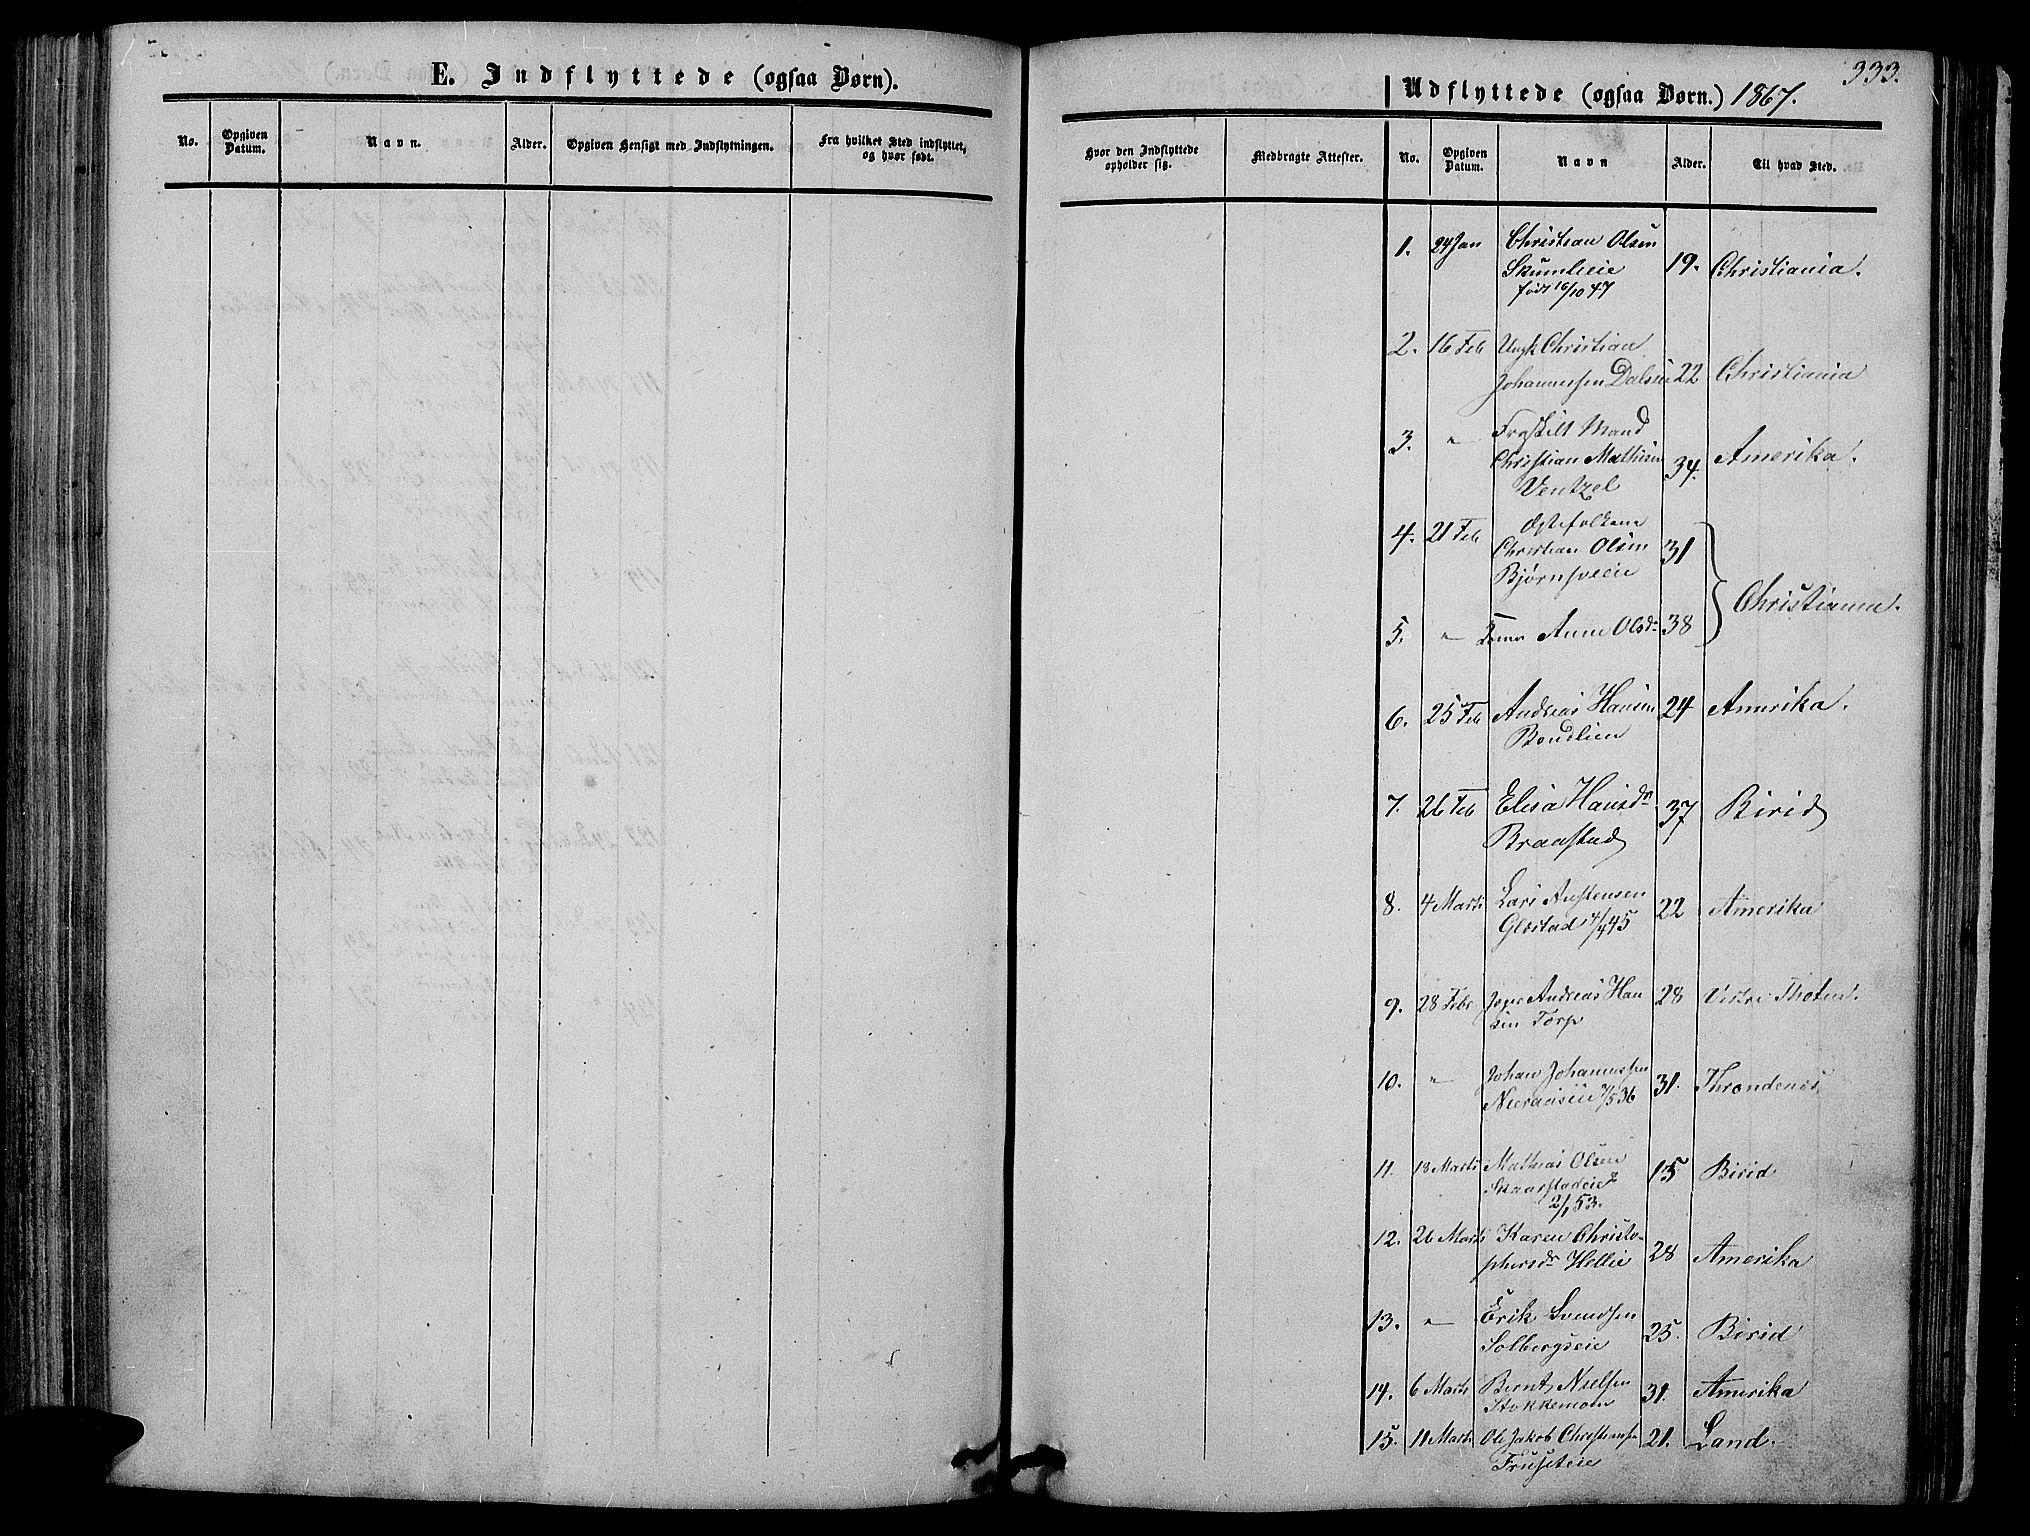 SAH, Vardal prestekontor, H/Ha/Hab/L0005: Klokkerbok nr. 5, 1854-1868, s. 333